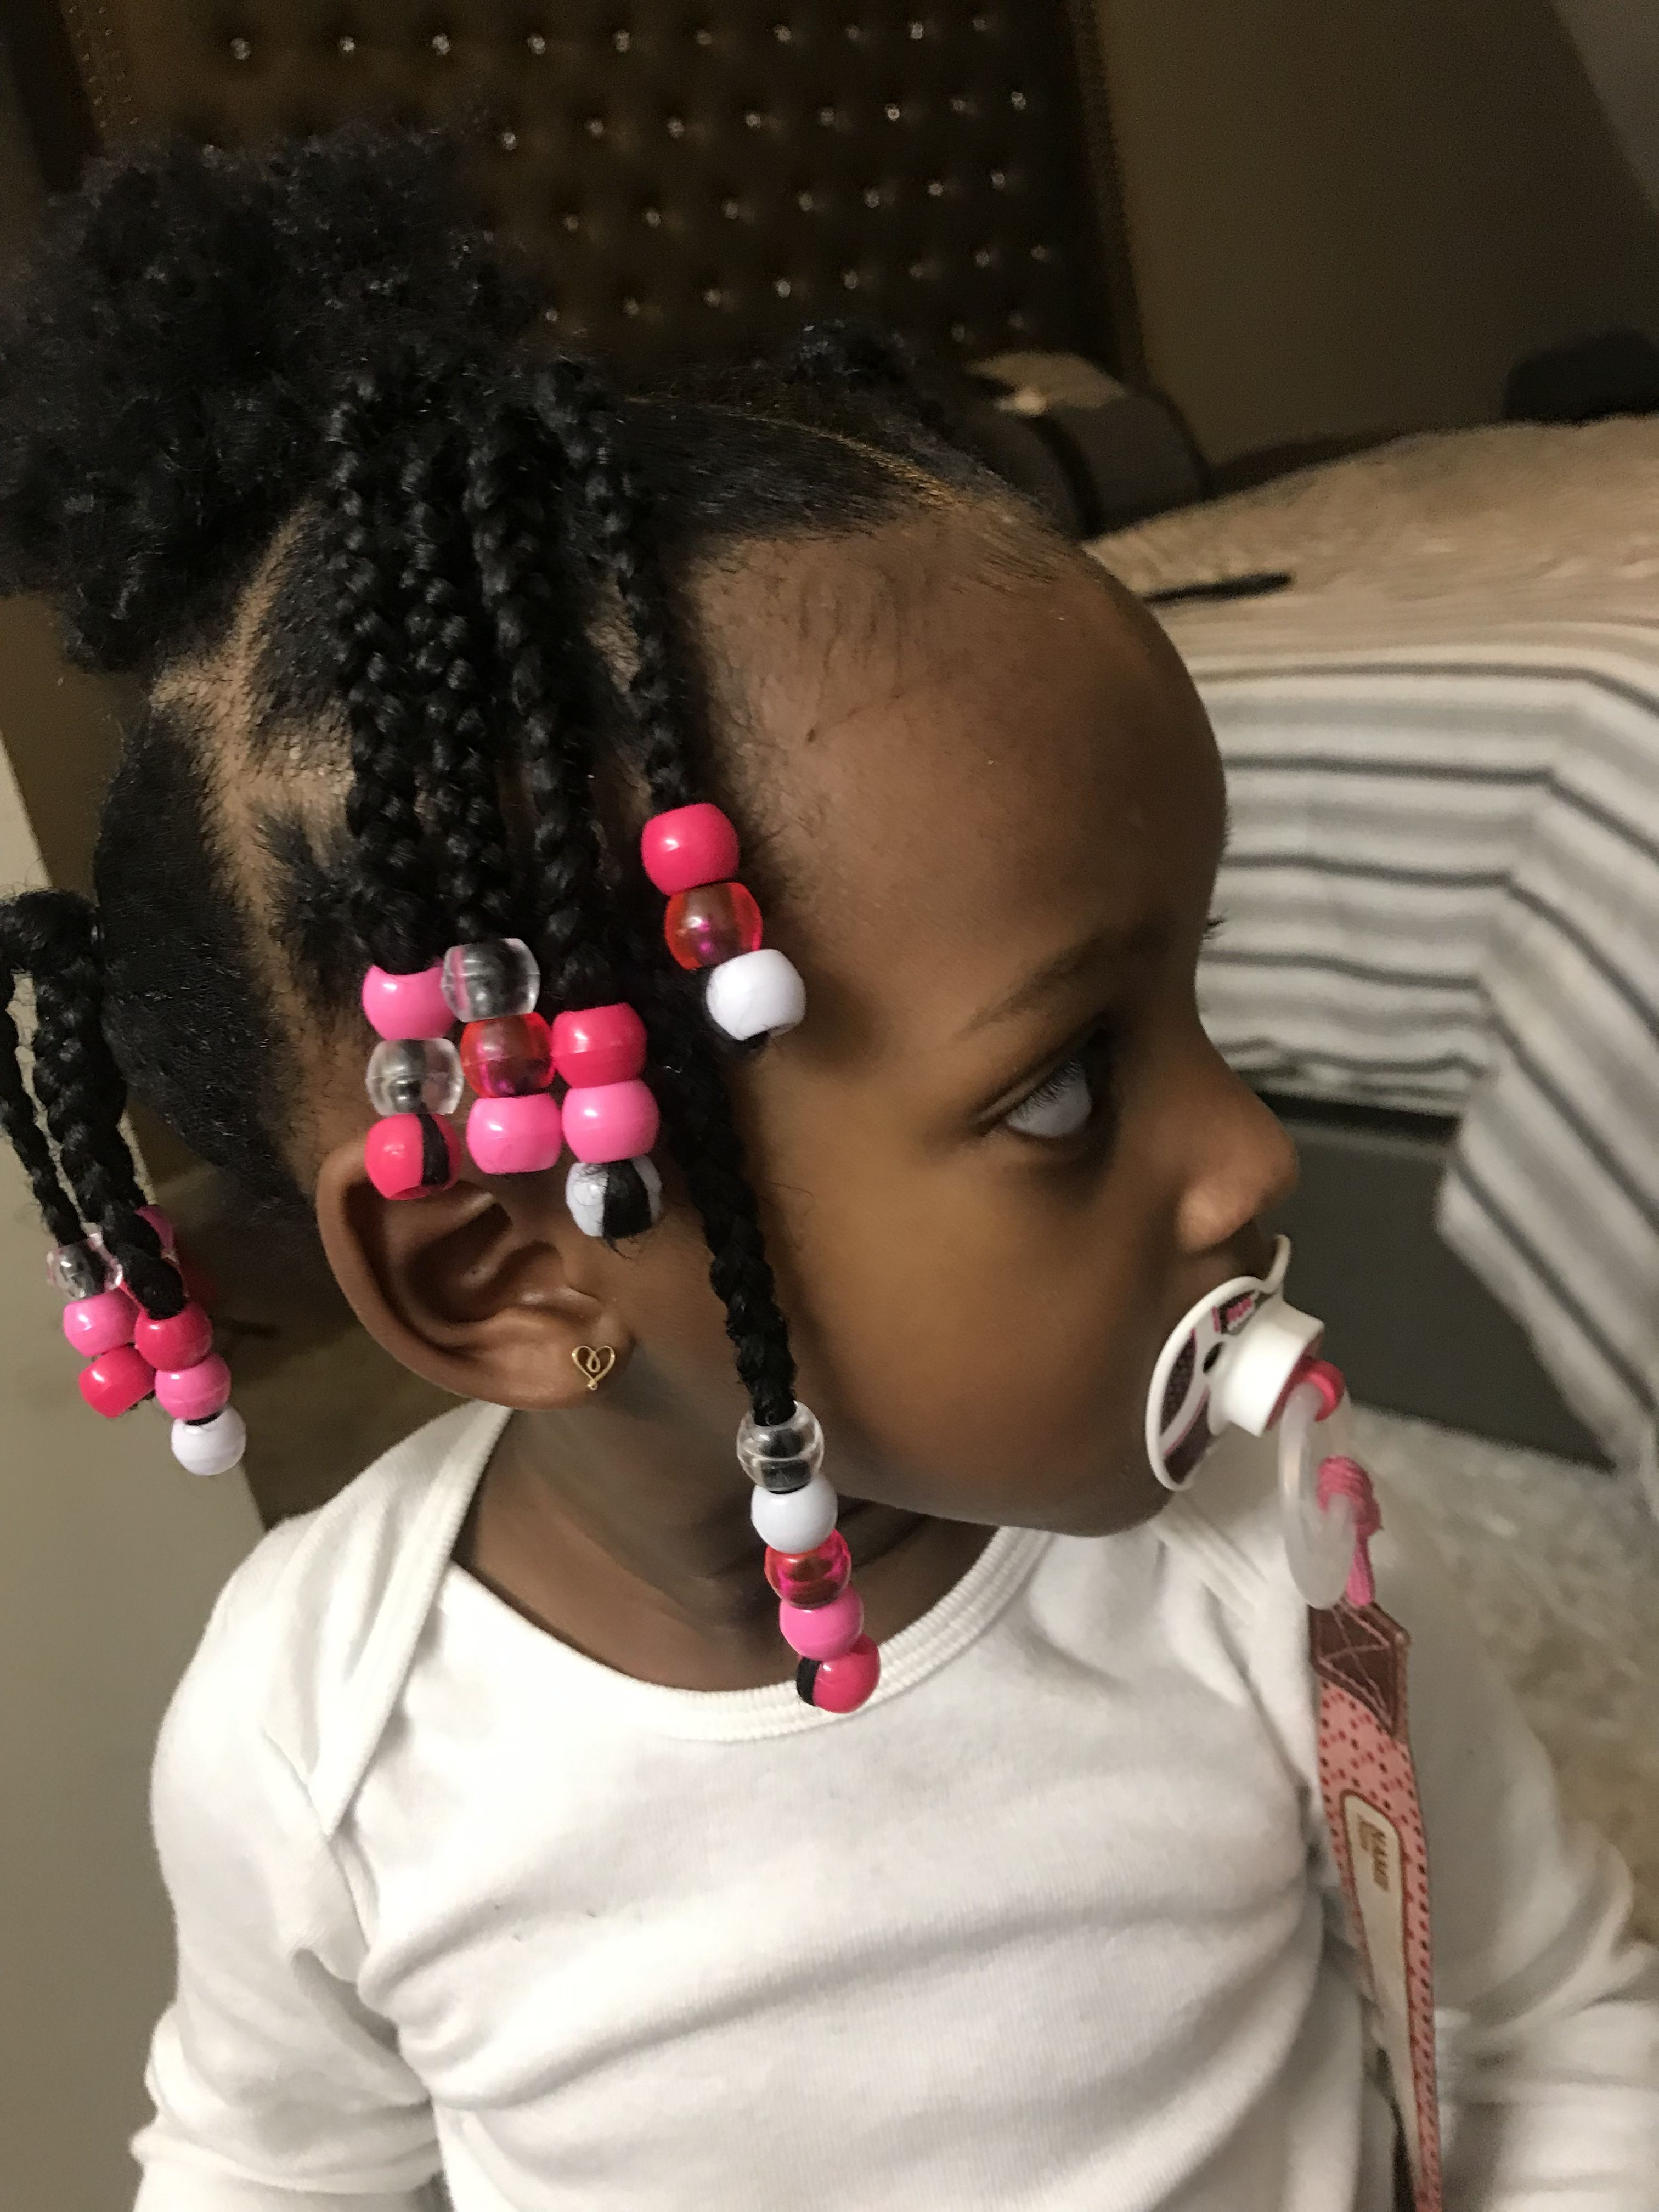 Toddler Braided Hairstyles Baby Braids One Year Old Hairstyles Quick Hairstyles For Toddler Girls Hair Styles Baby Girl Haircuts Baby Girl Hairstyles